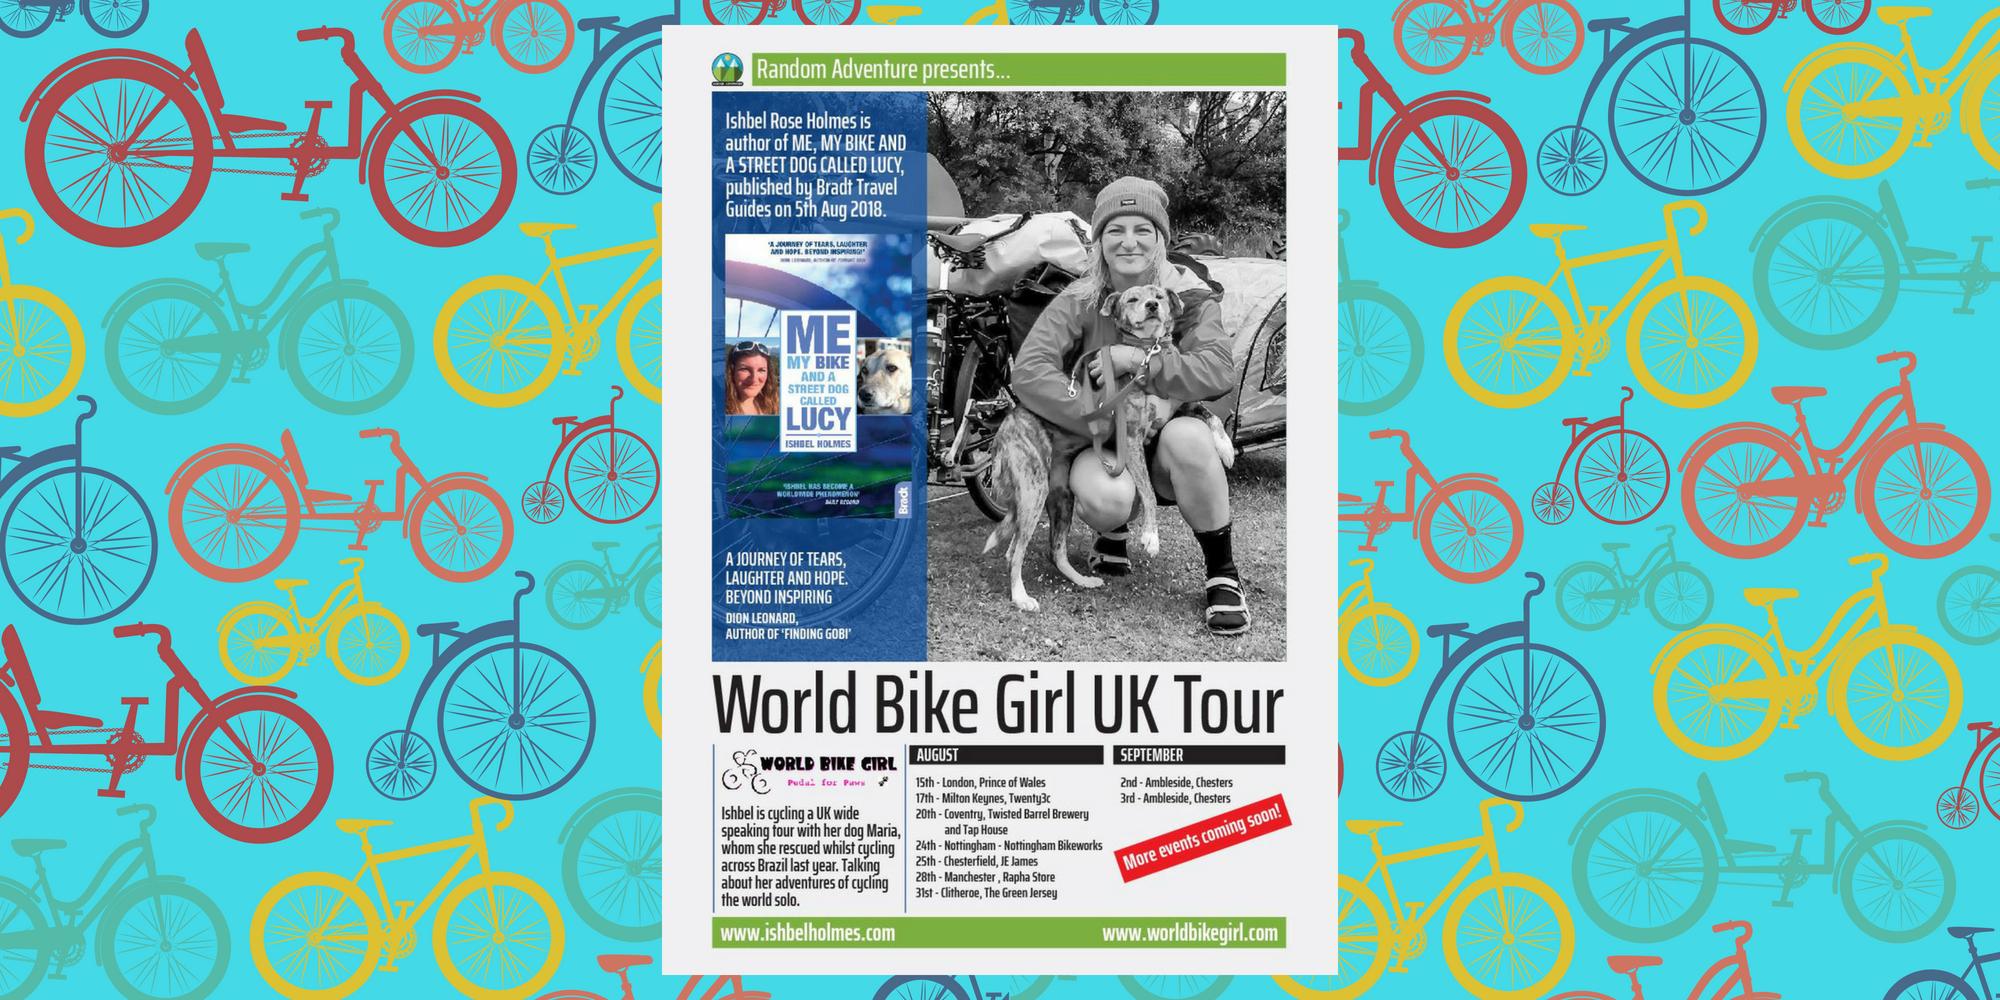 The World Bike Girl Book & Speaking Tour UK 2018